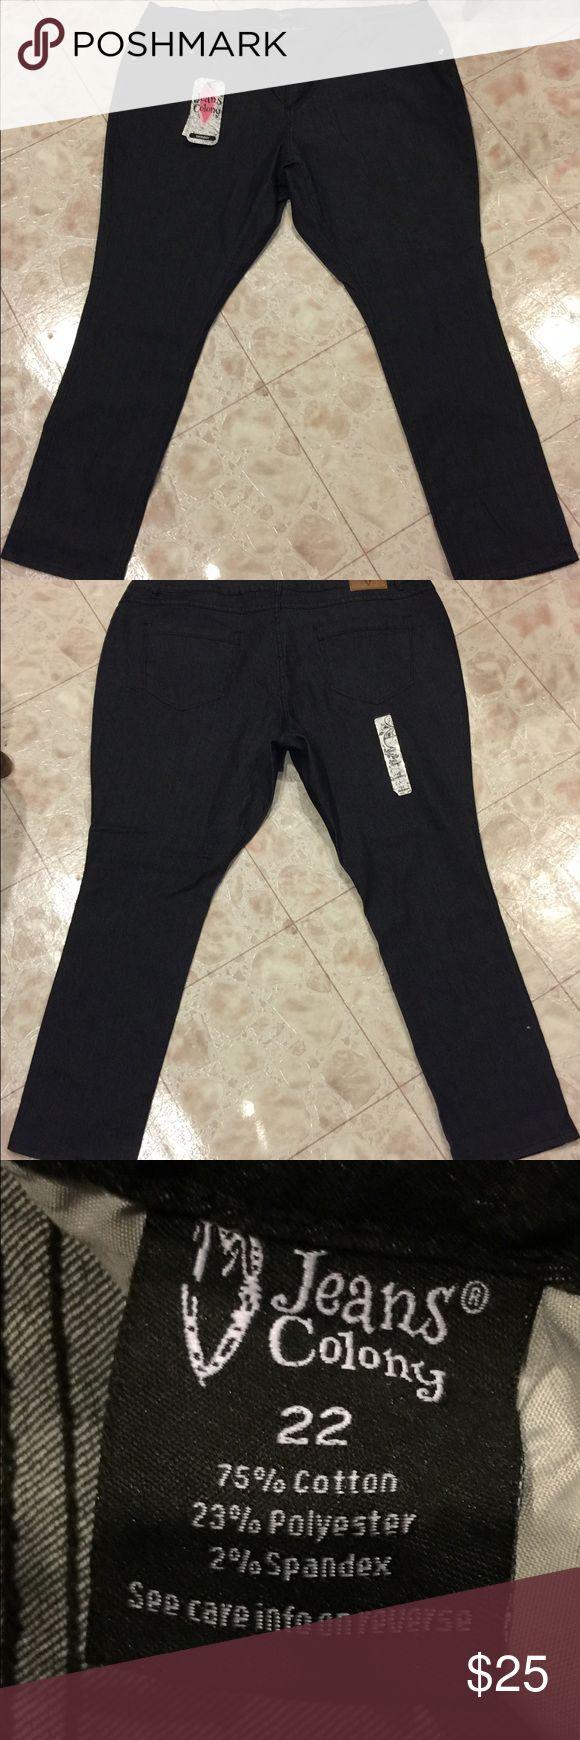 Women's Jeans Colony Skinny Jeans Size 22 Plus size brand new skinny jeans from Jeans Colony in Black Jeans Colony Jeans Skinny